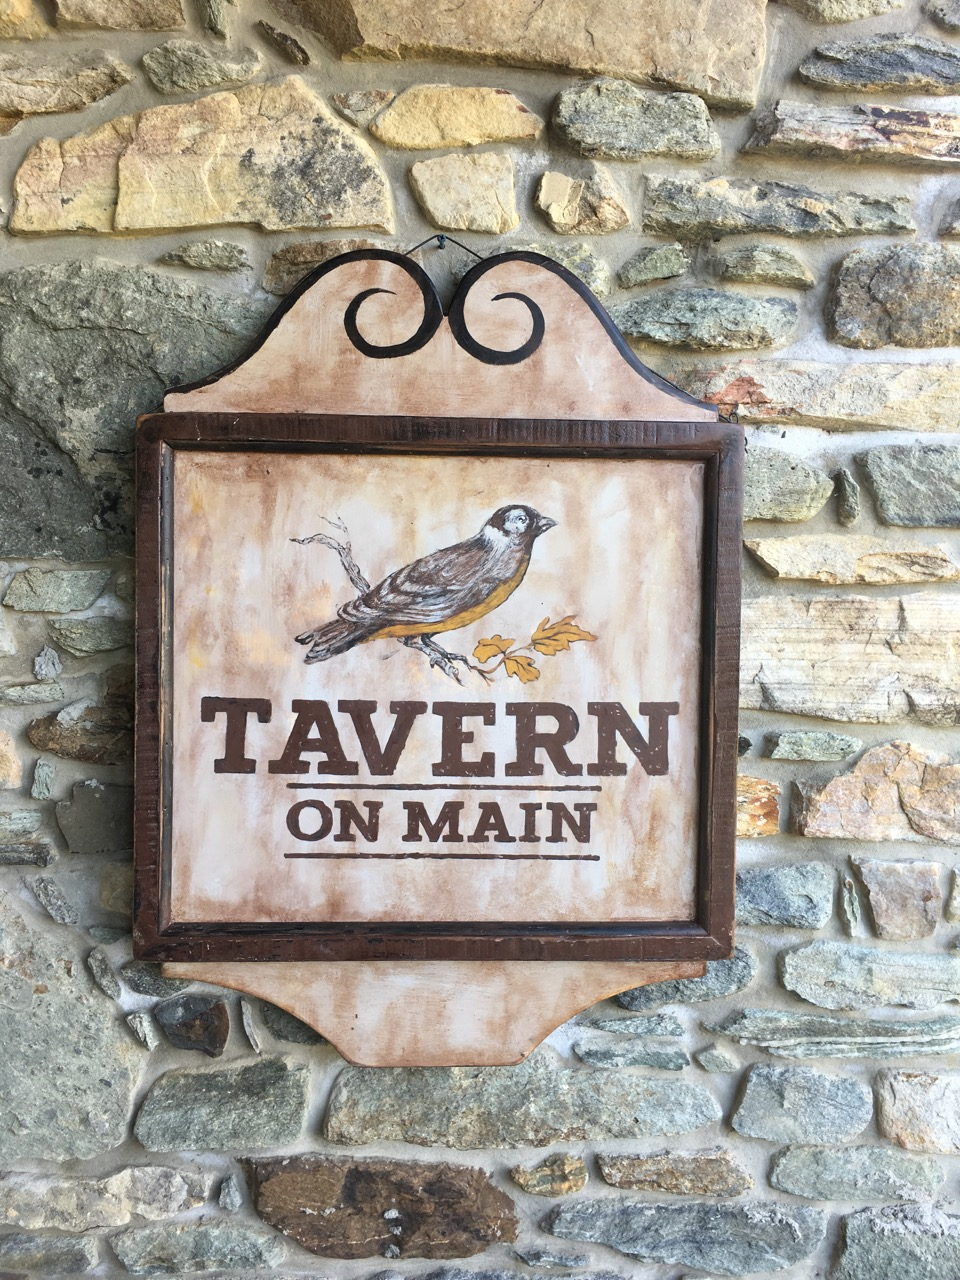 colonial american sign company_tavern on main - 1.jpg